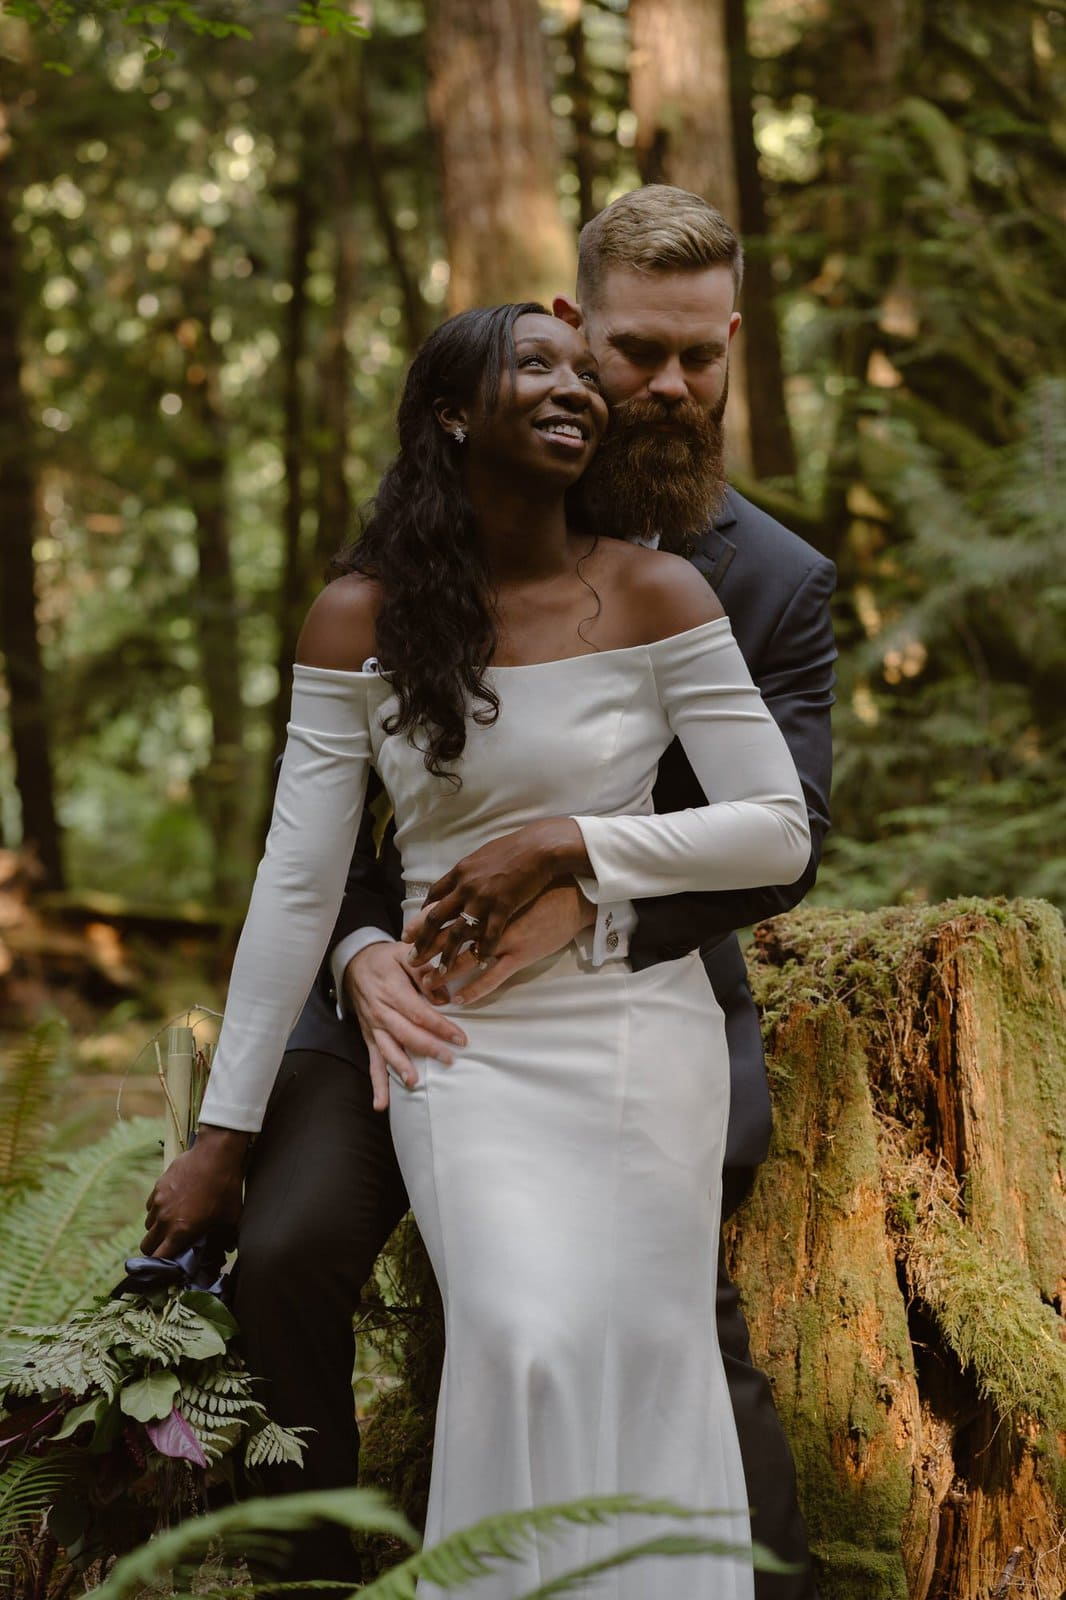 Bridal portraits in Washington park.